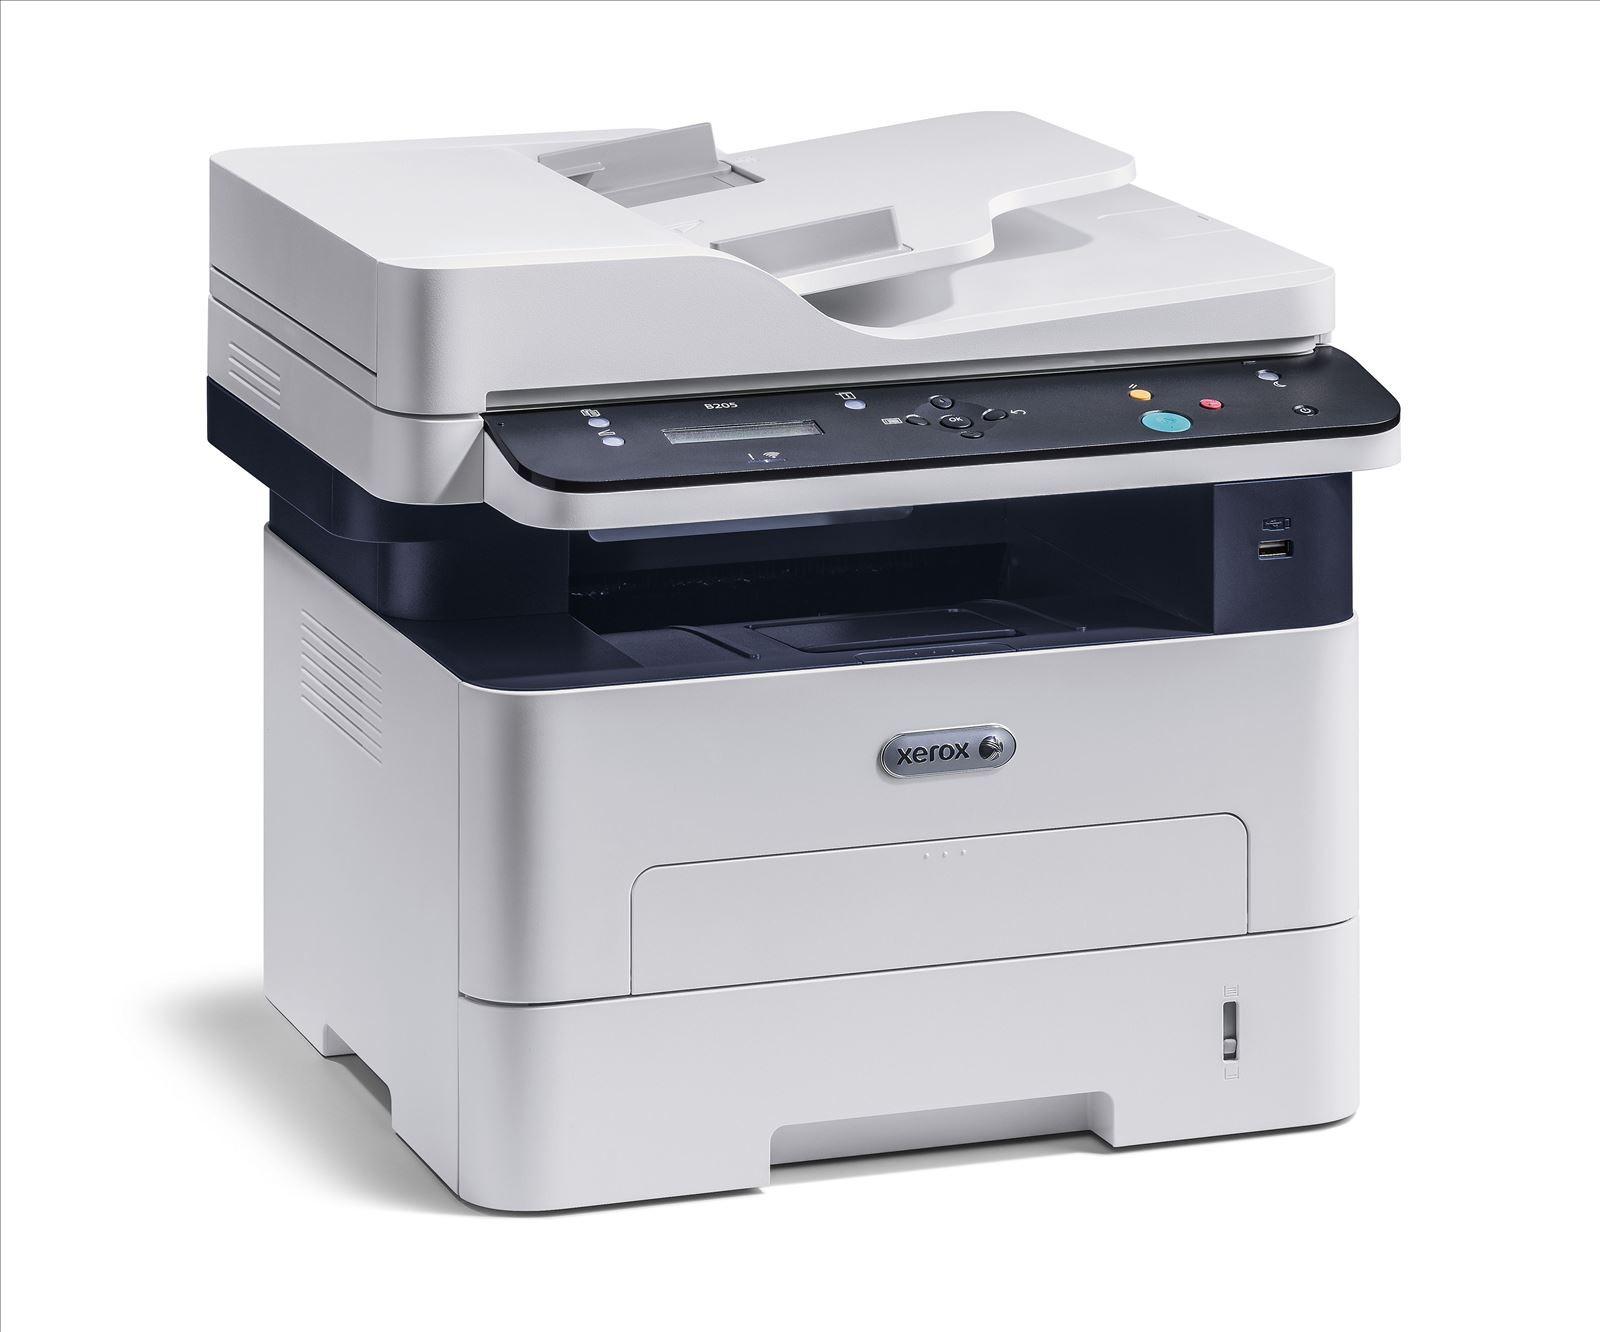 Xerox B205 Laser 30 ppm 1200 x 1200 DPI A4 Wi-Fi